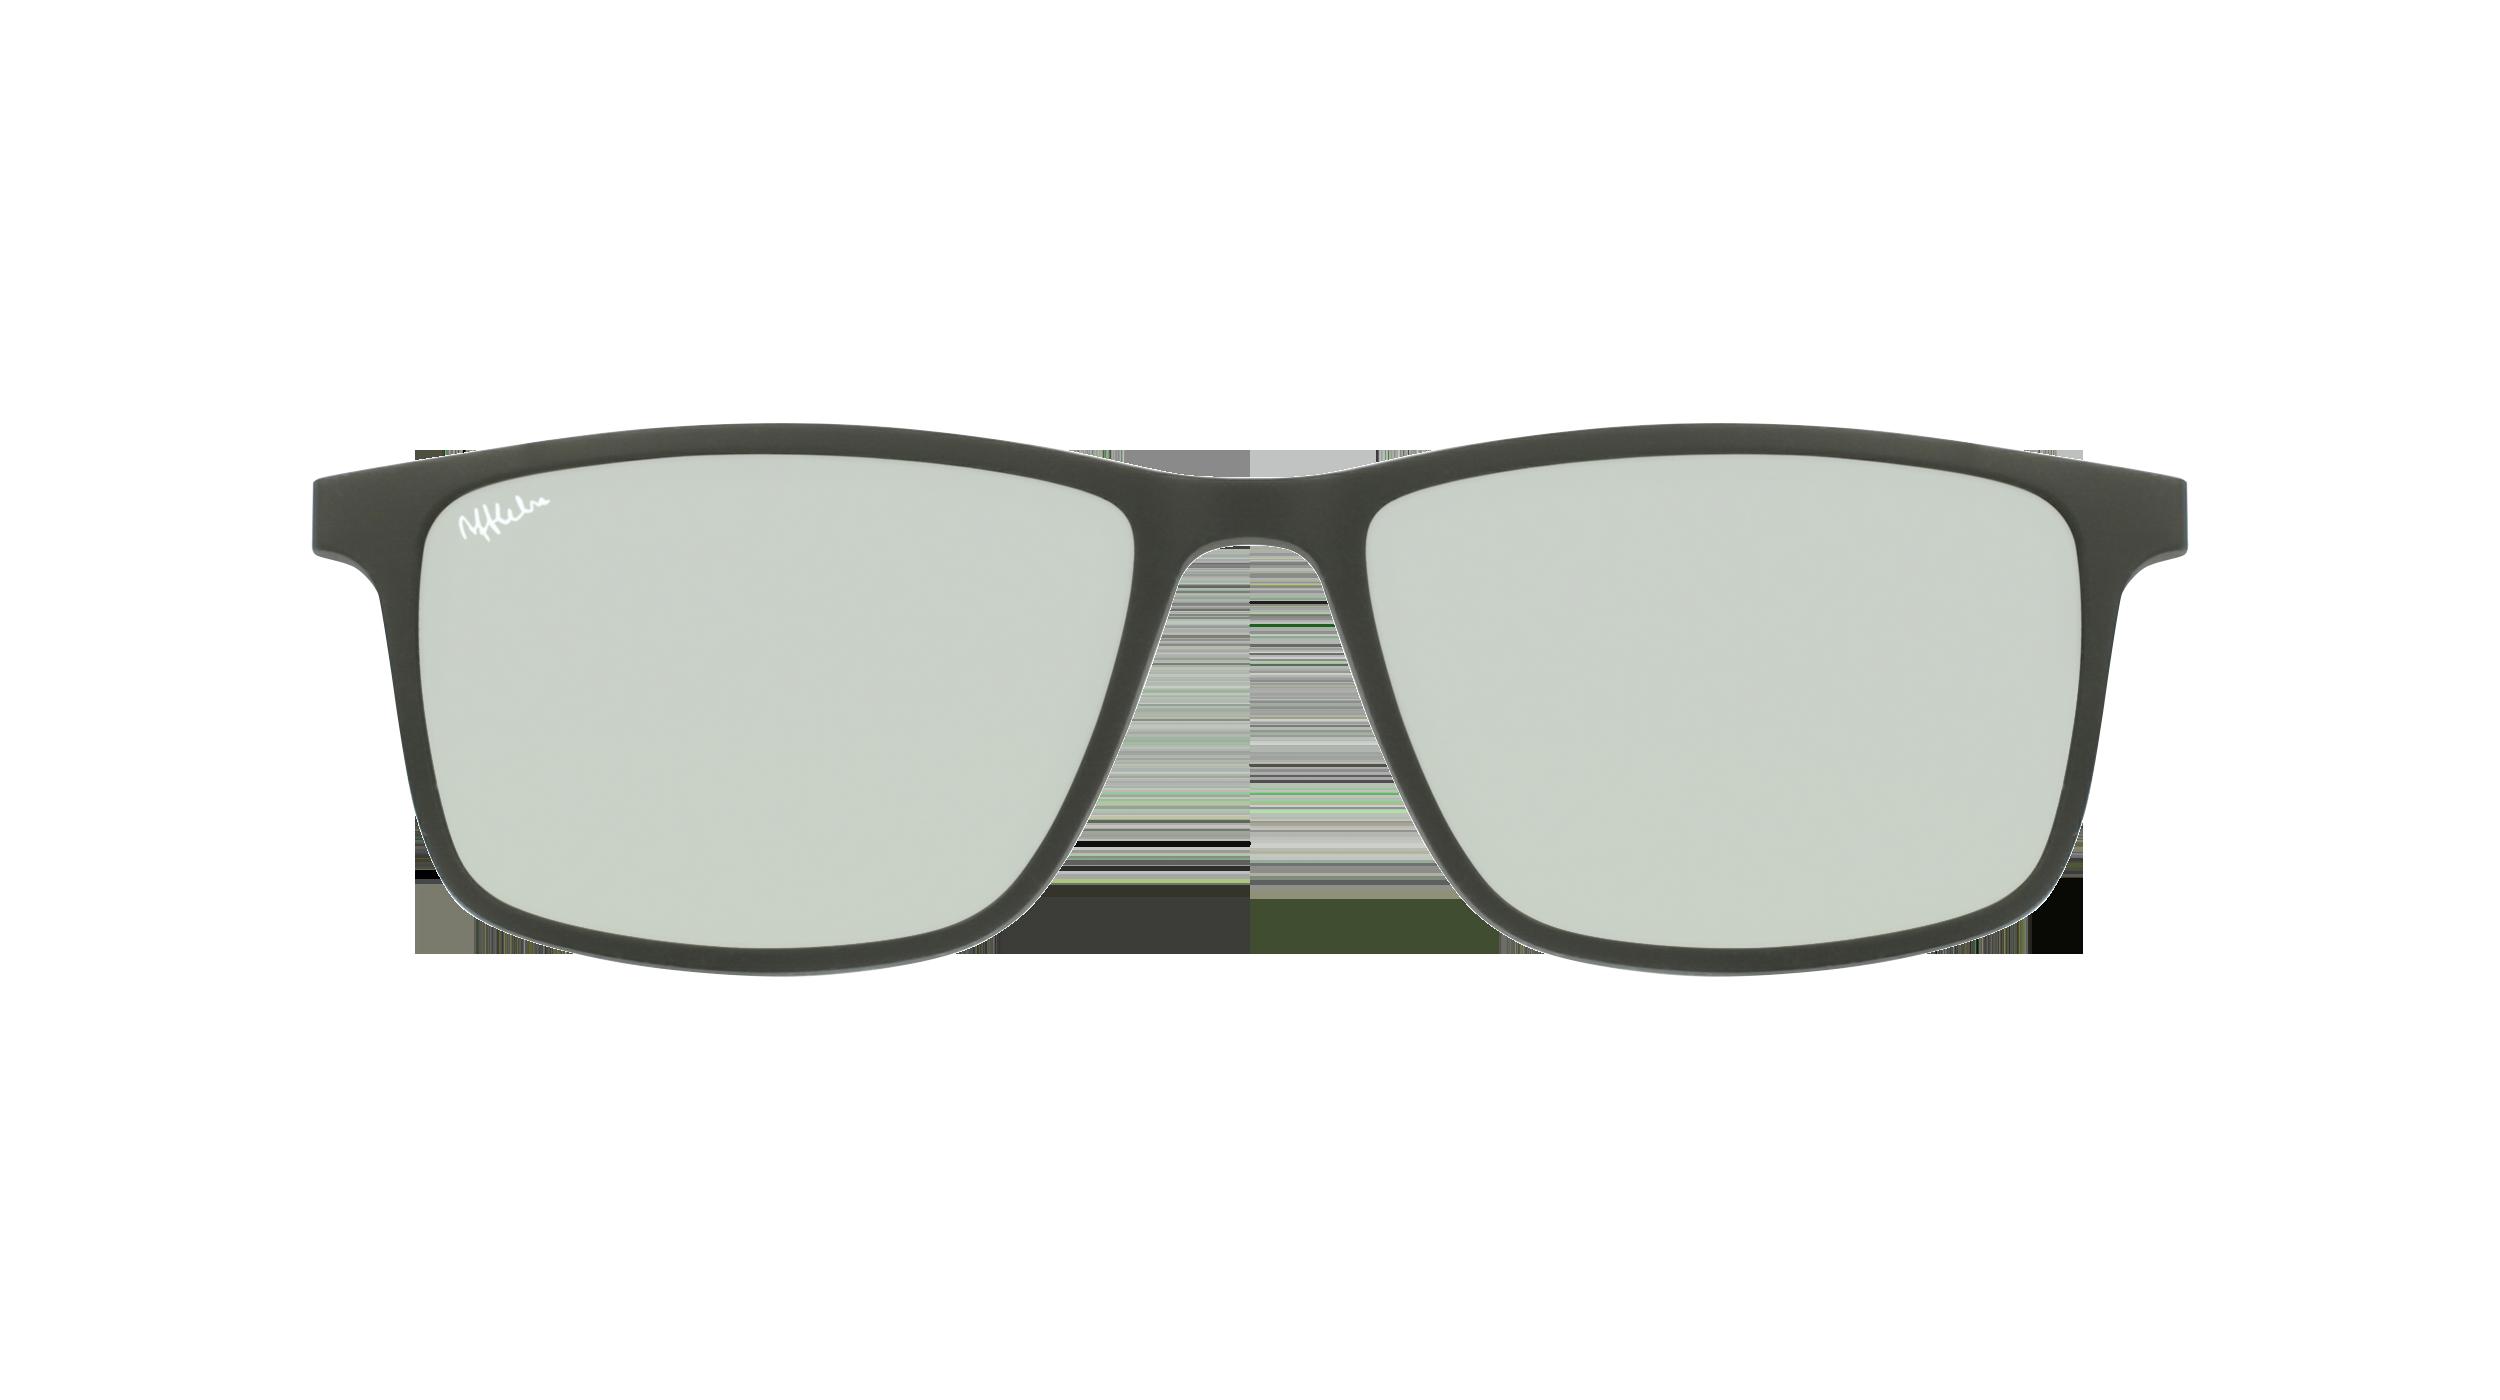 afflelou/france/products/smart_clip/clips_glasses/07630036457122.png